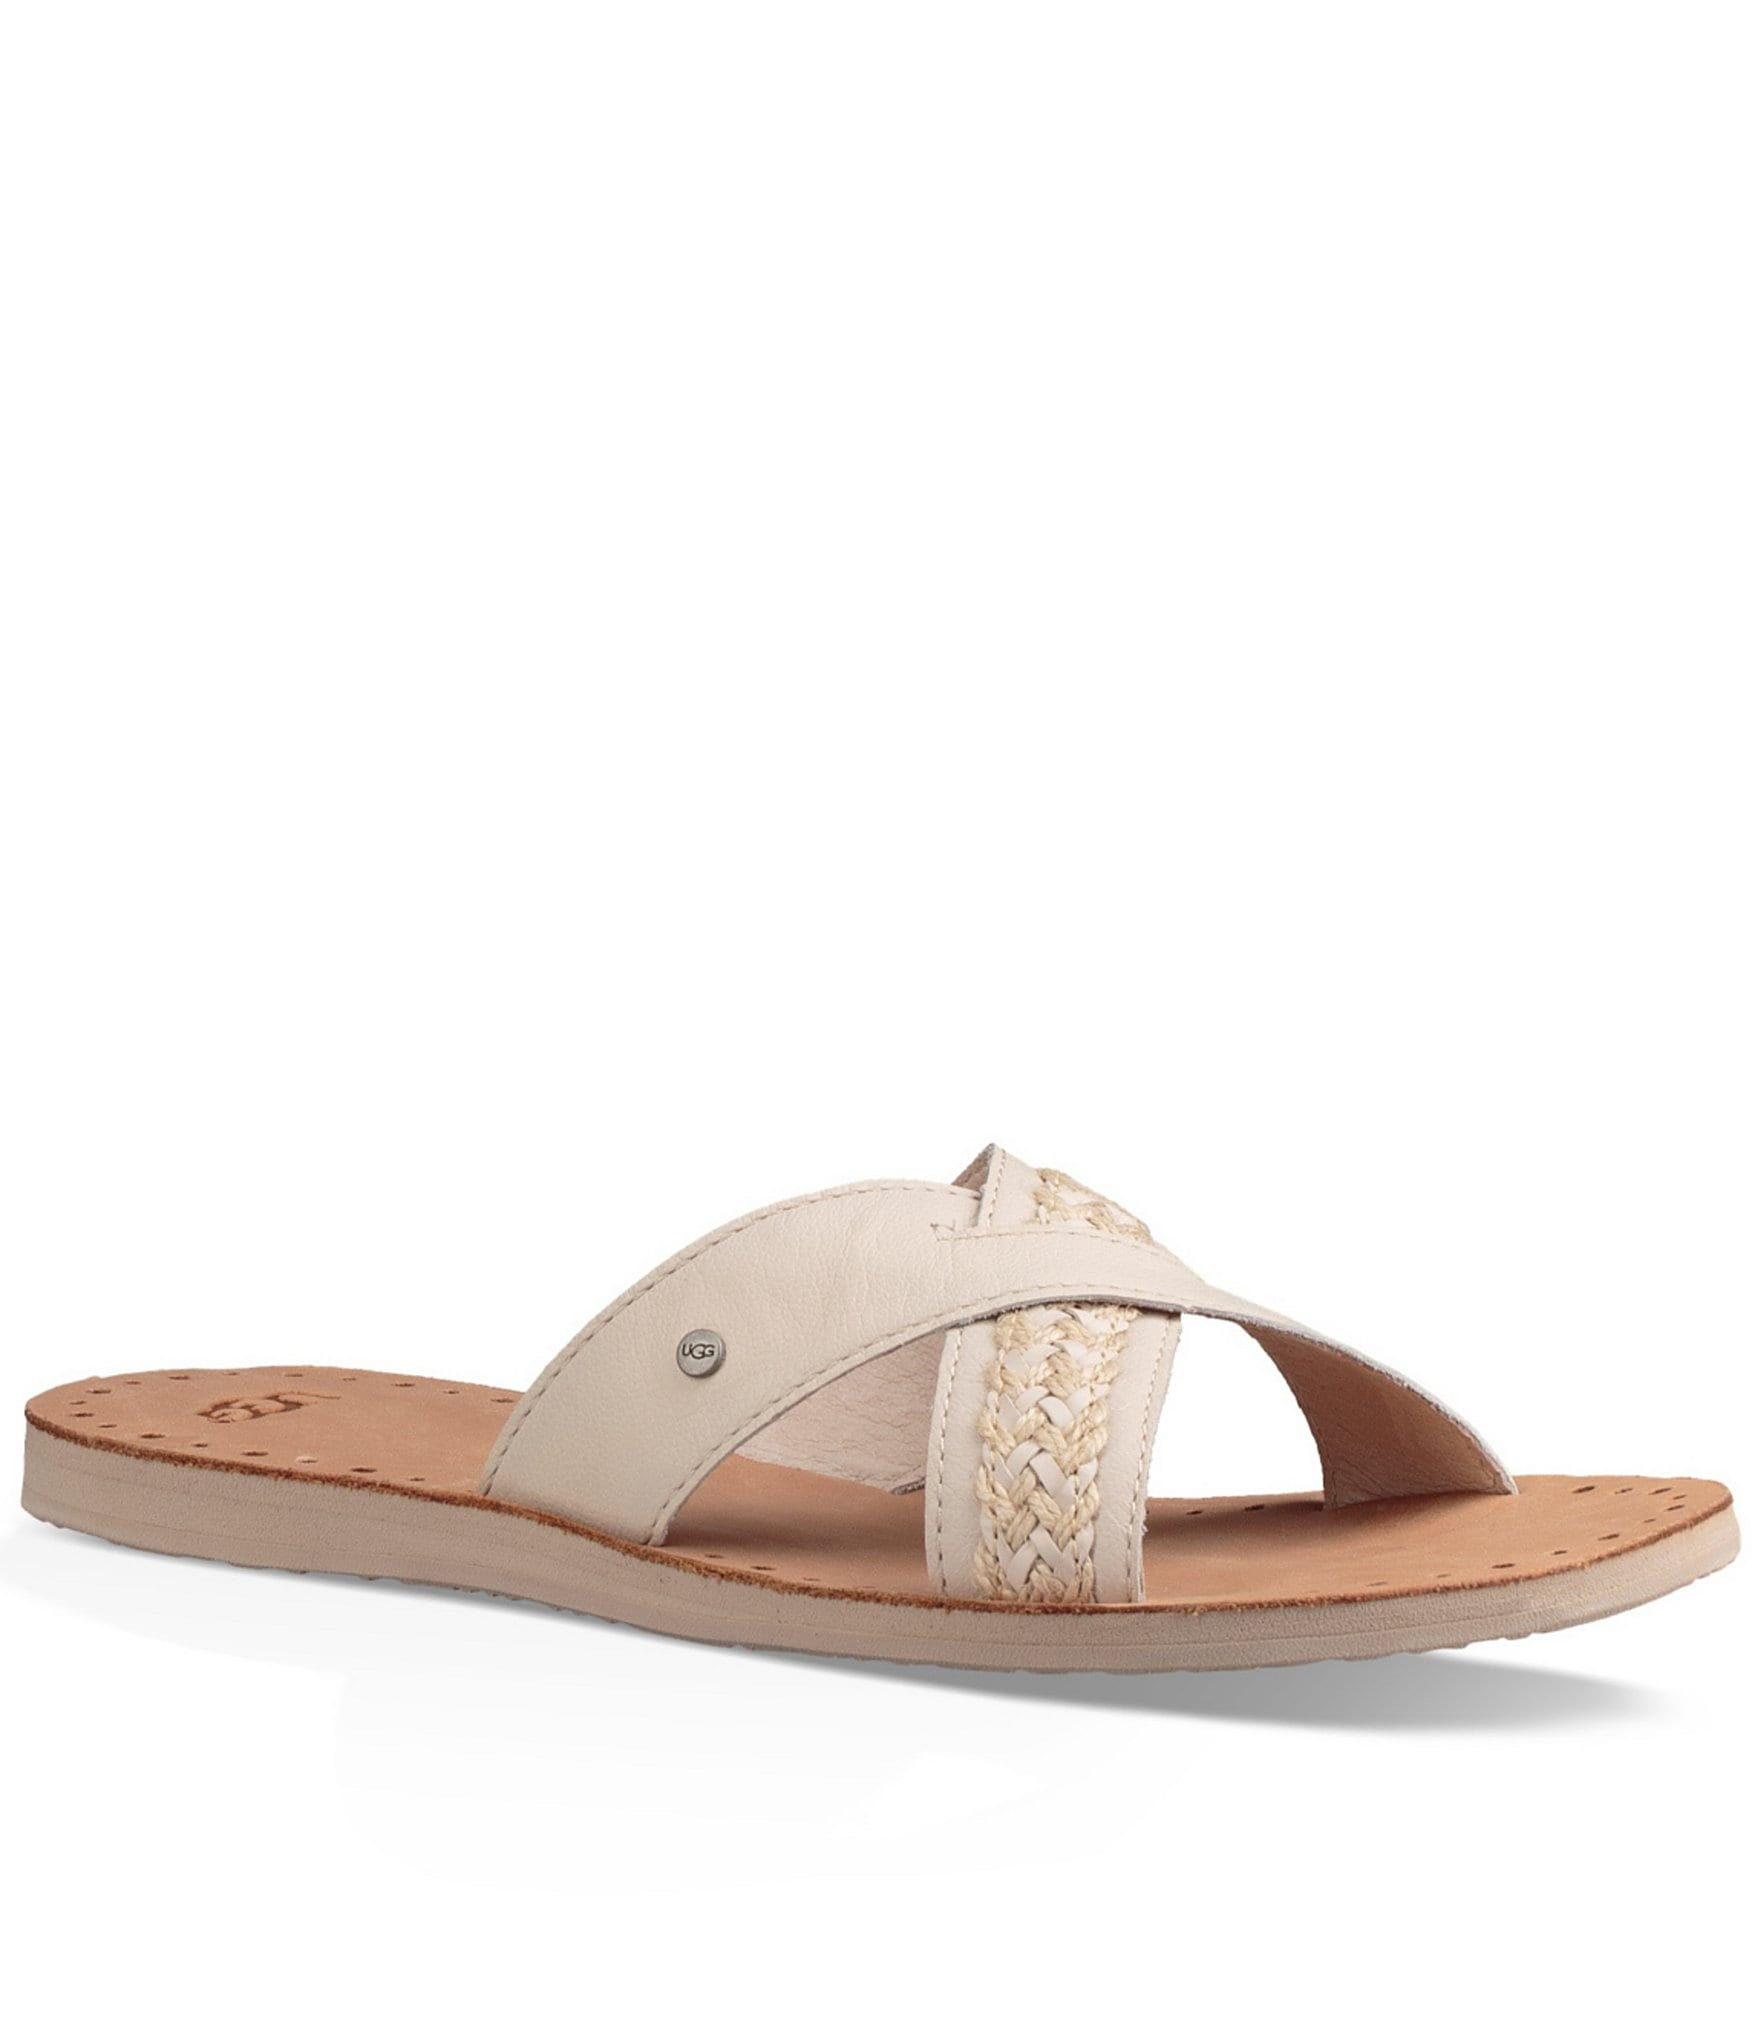 Ugg 174 Lexia Slide On Sandals Dillards